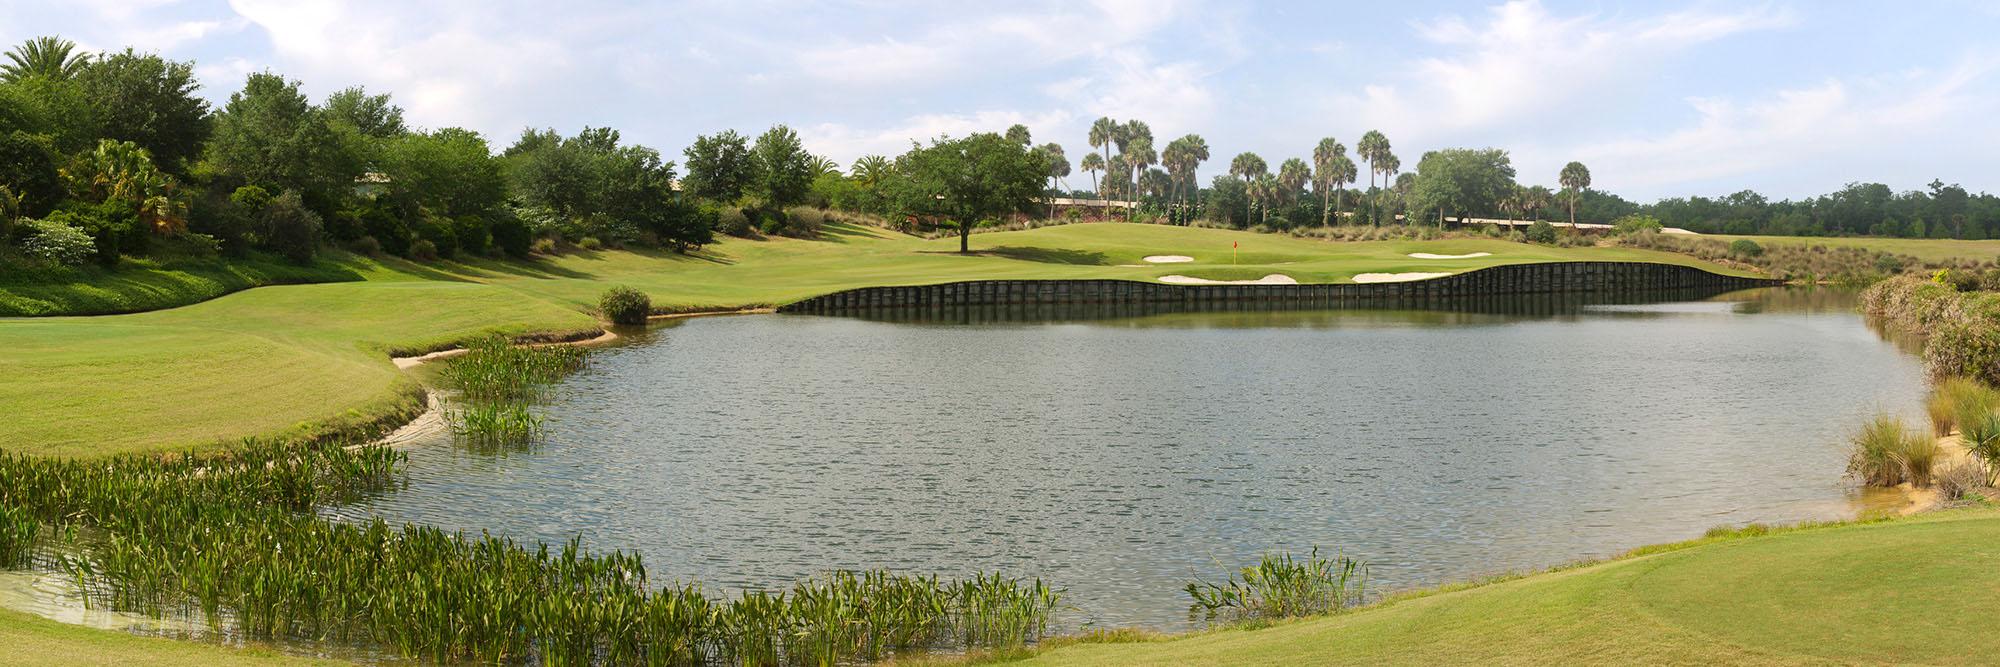 Golf Course Image - Reunion Resort Nicklaus No. 16